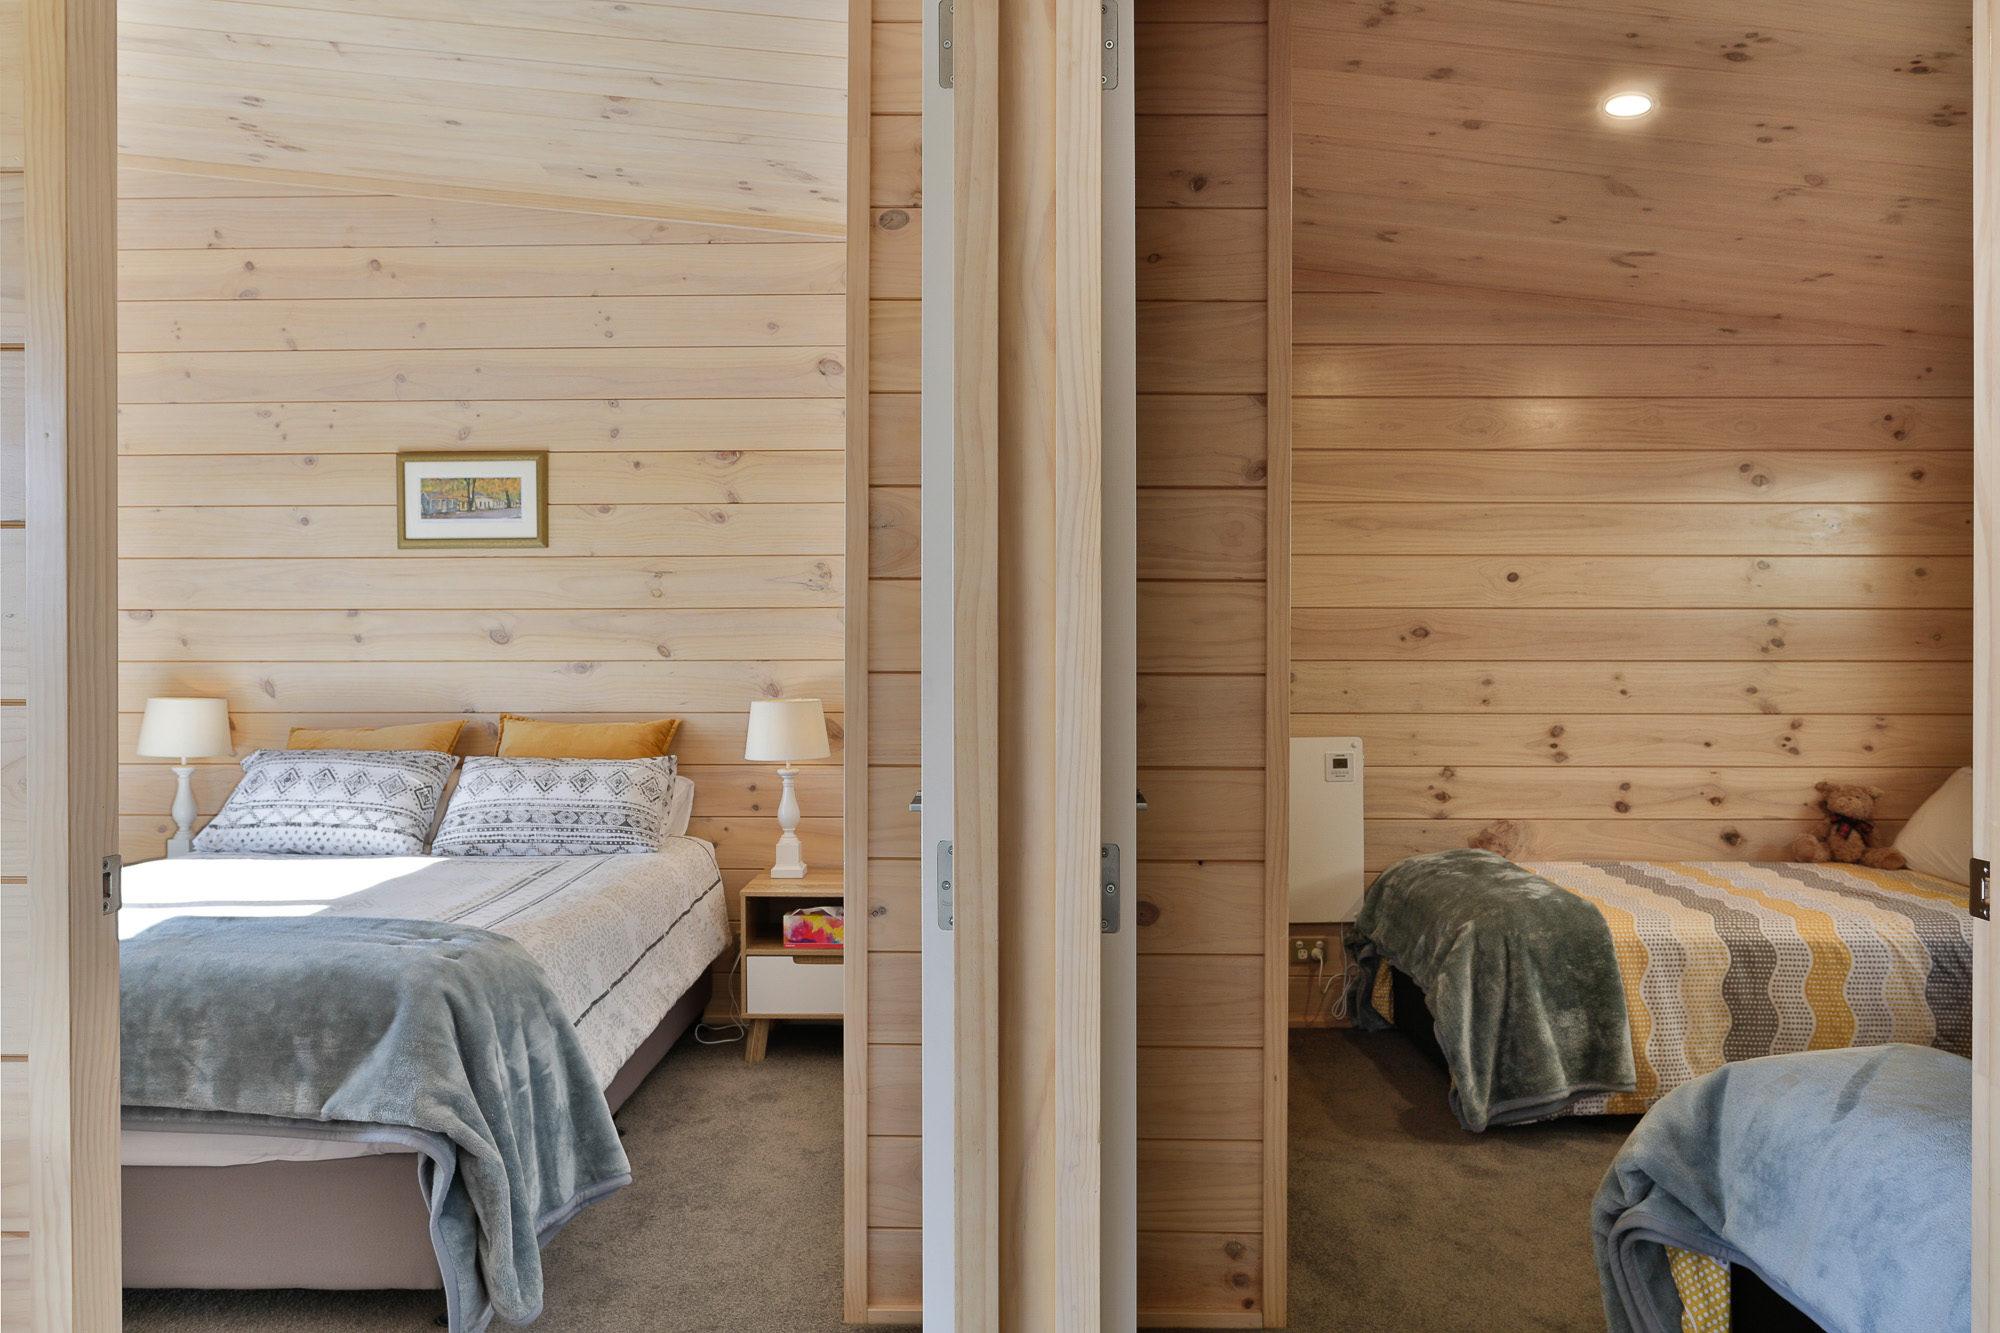 Two bedroom Lockwood second dwelling